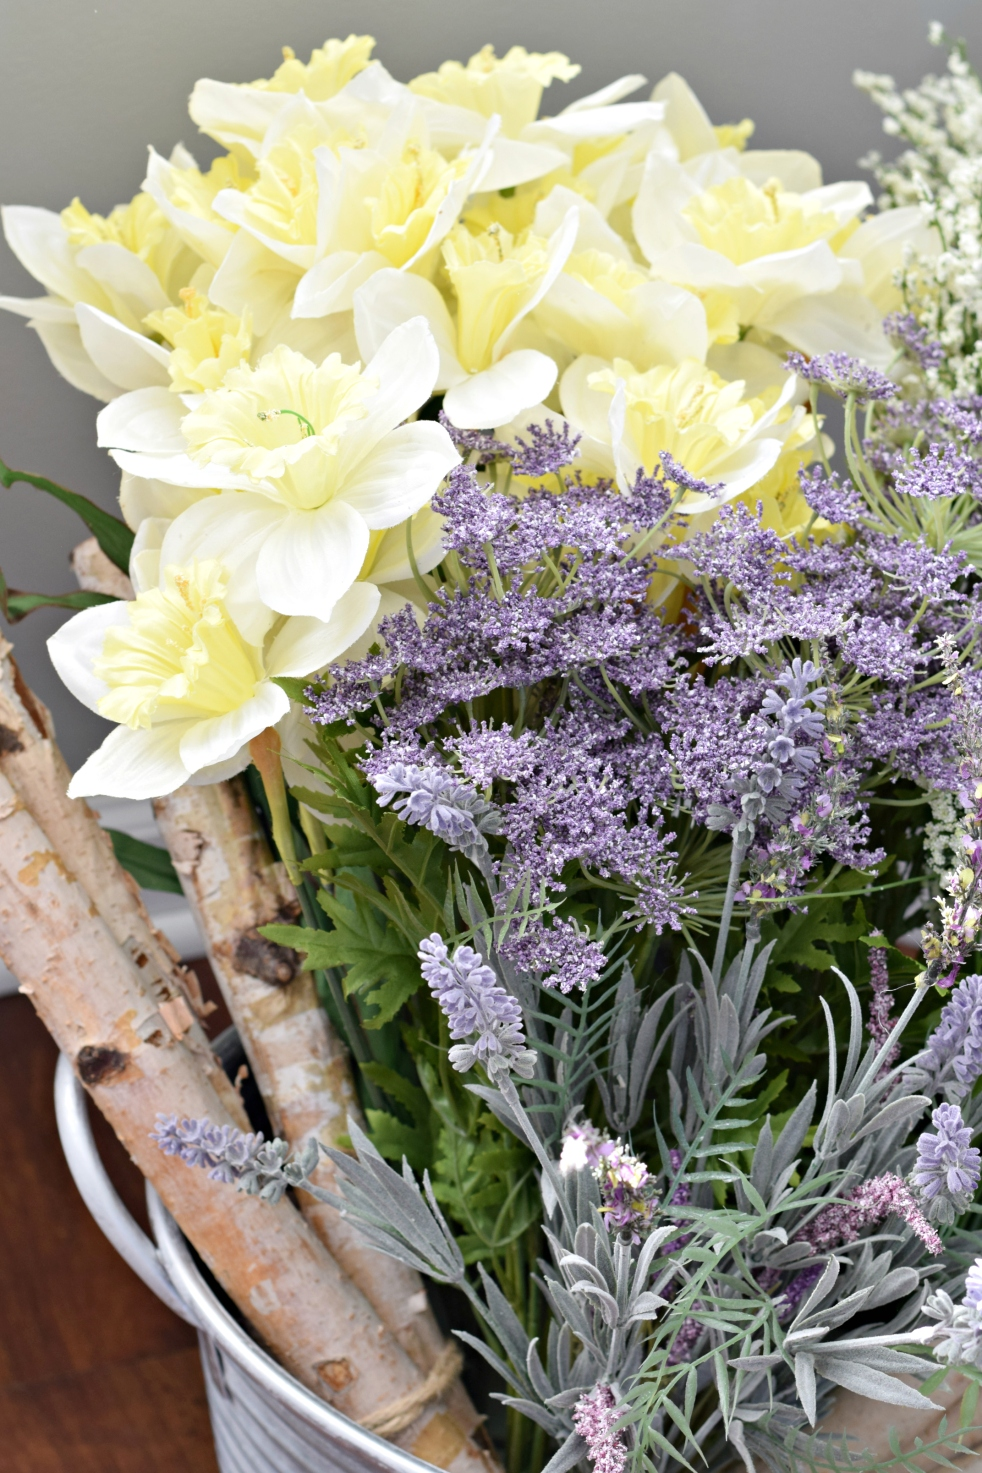 DIY Spring Decor |www.pearlsandsportsbras.com|